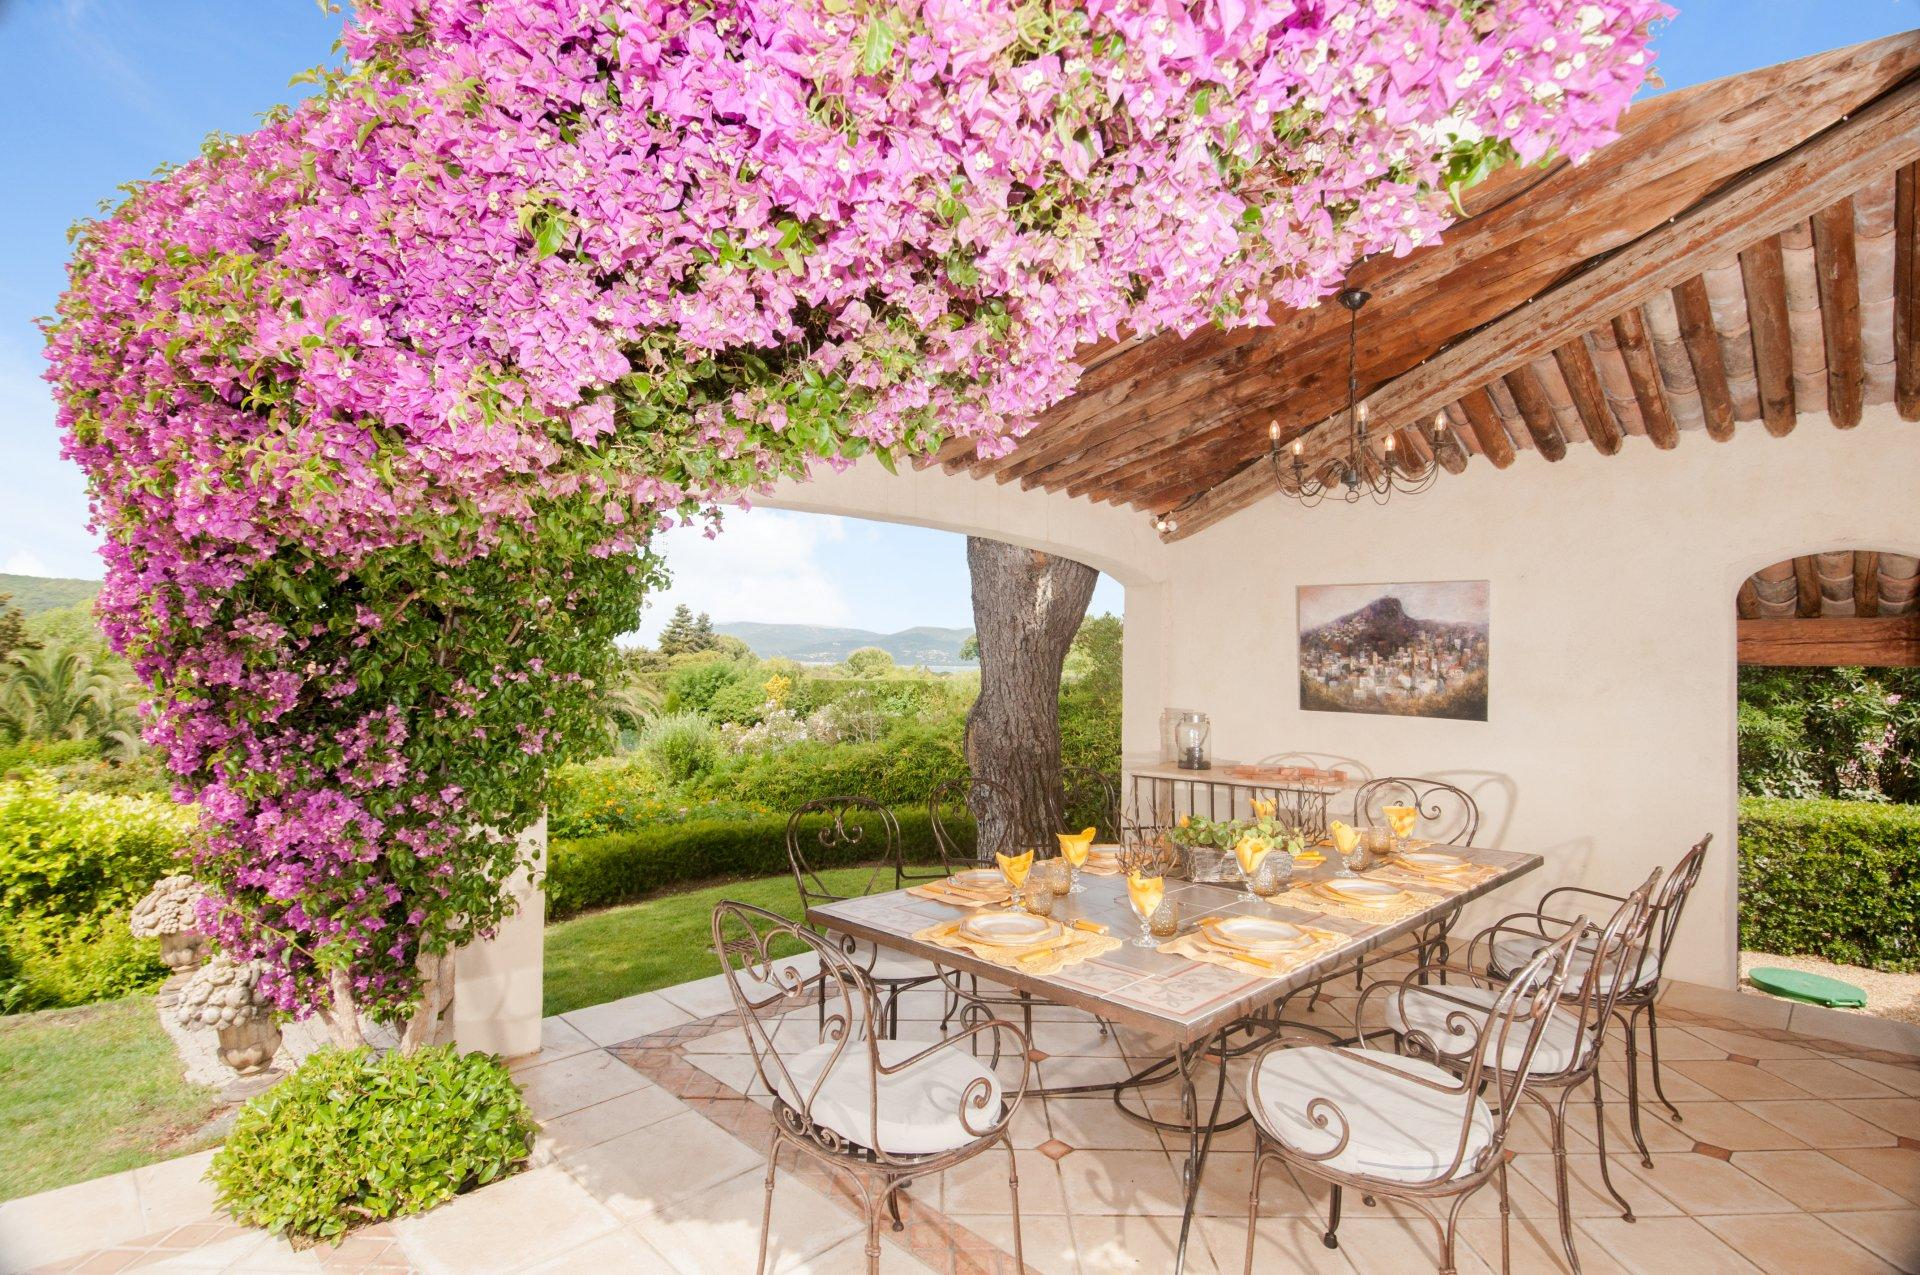 Outdoor Dining Table, L'Emeraude, St Tropez, St Tropez Var.